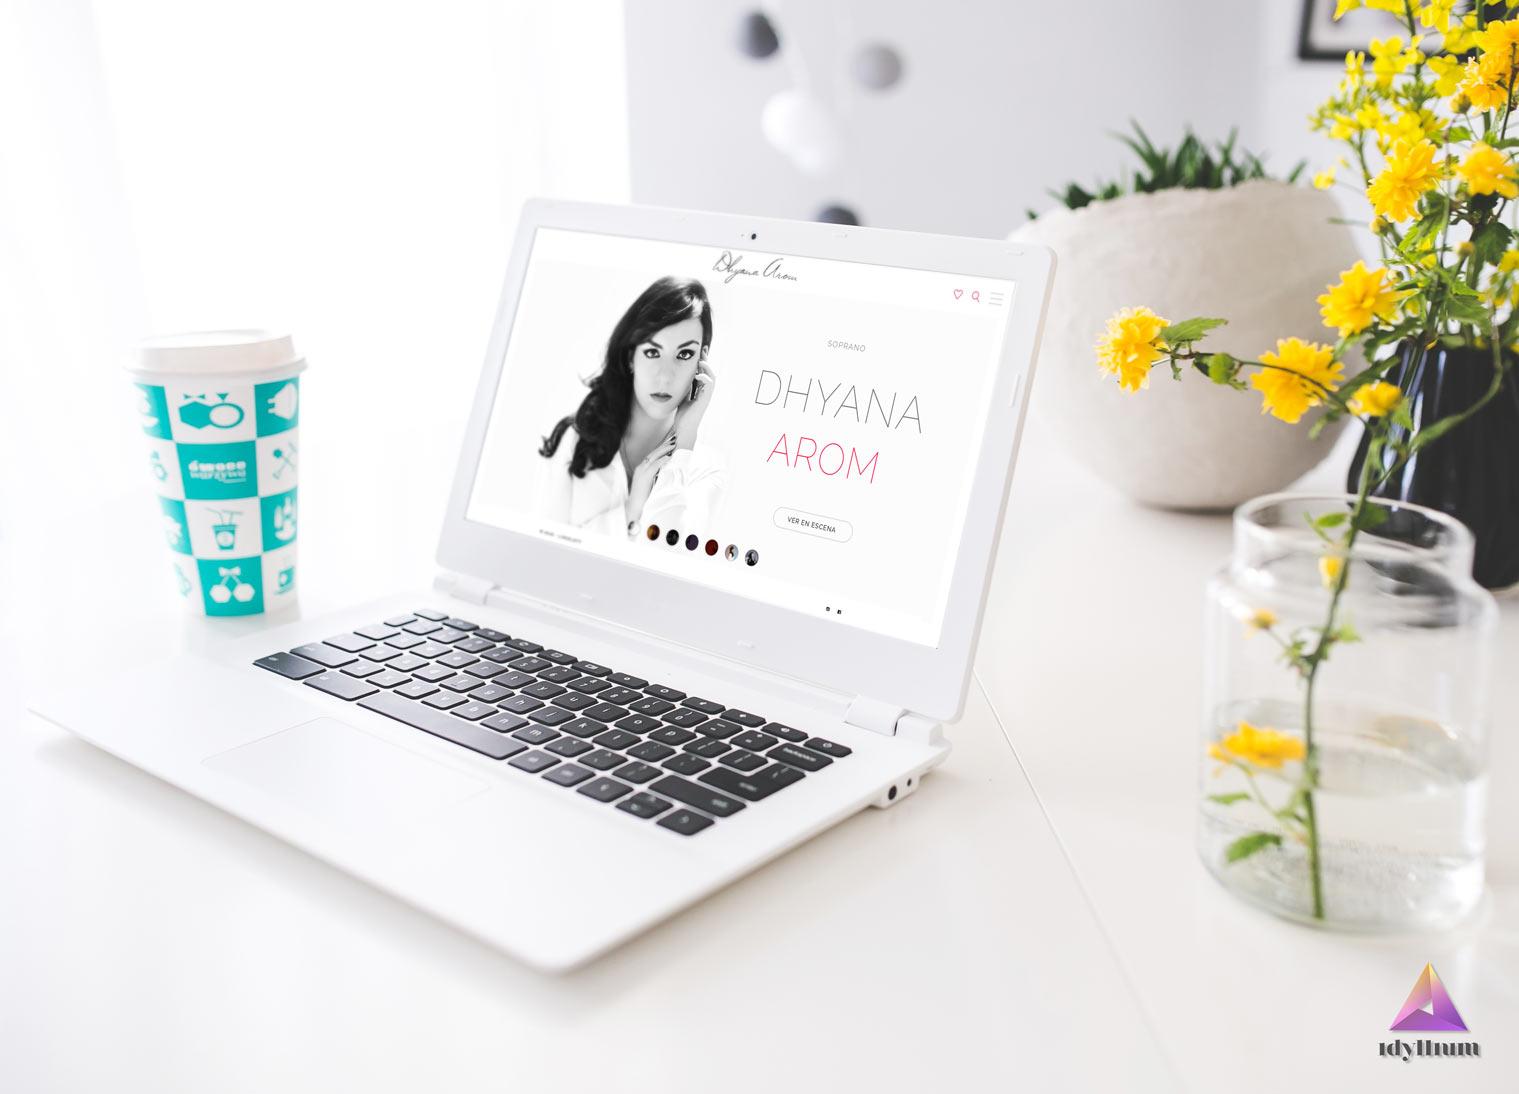 Dhyana-web-2